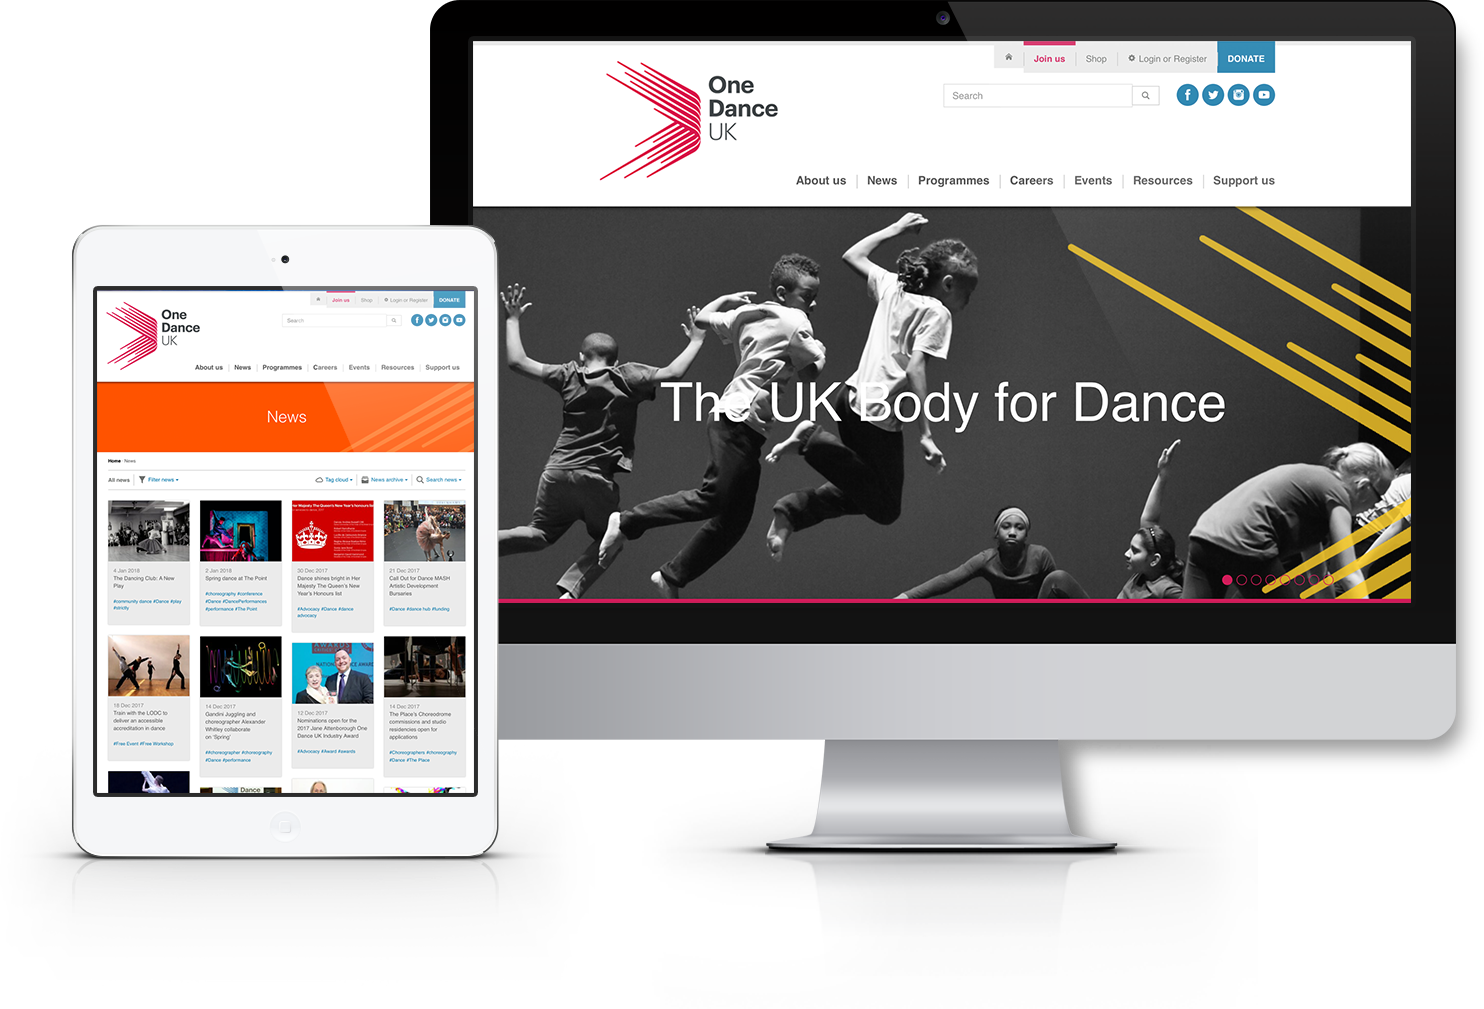 One Dance UK